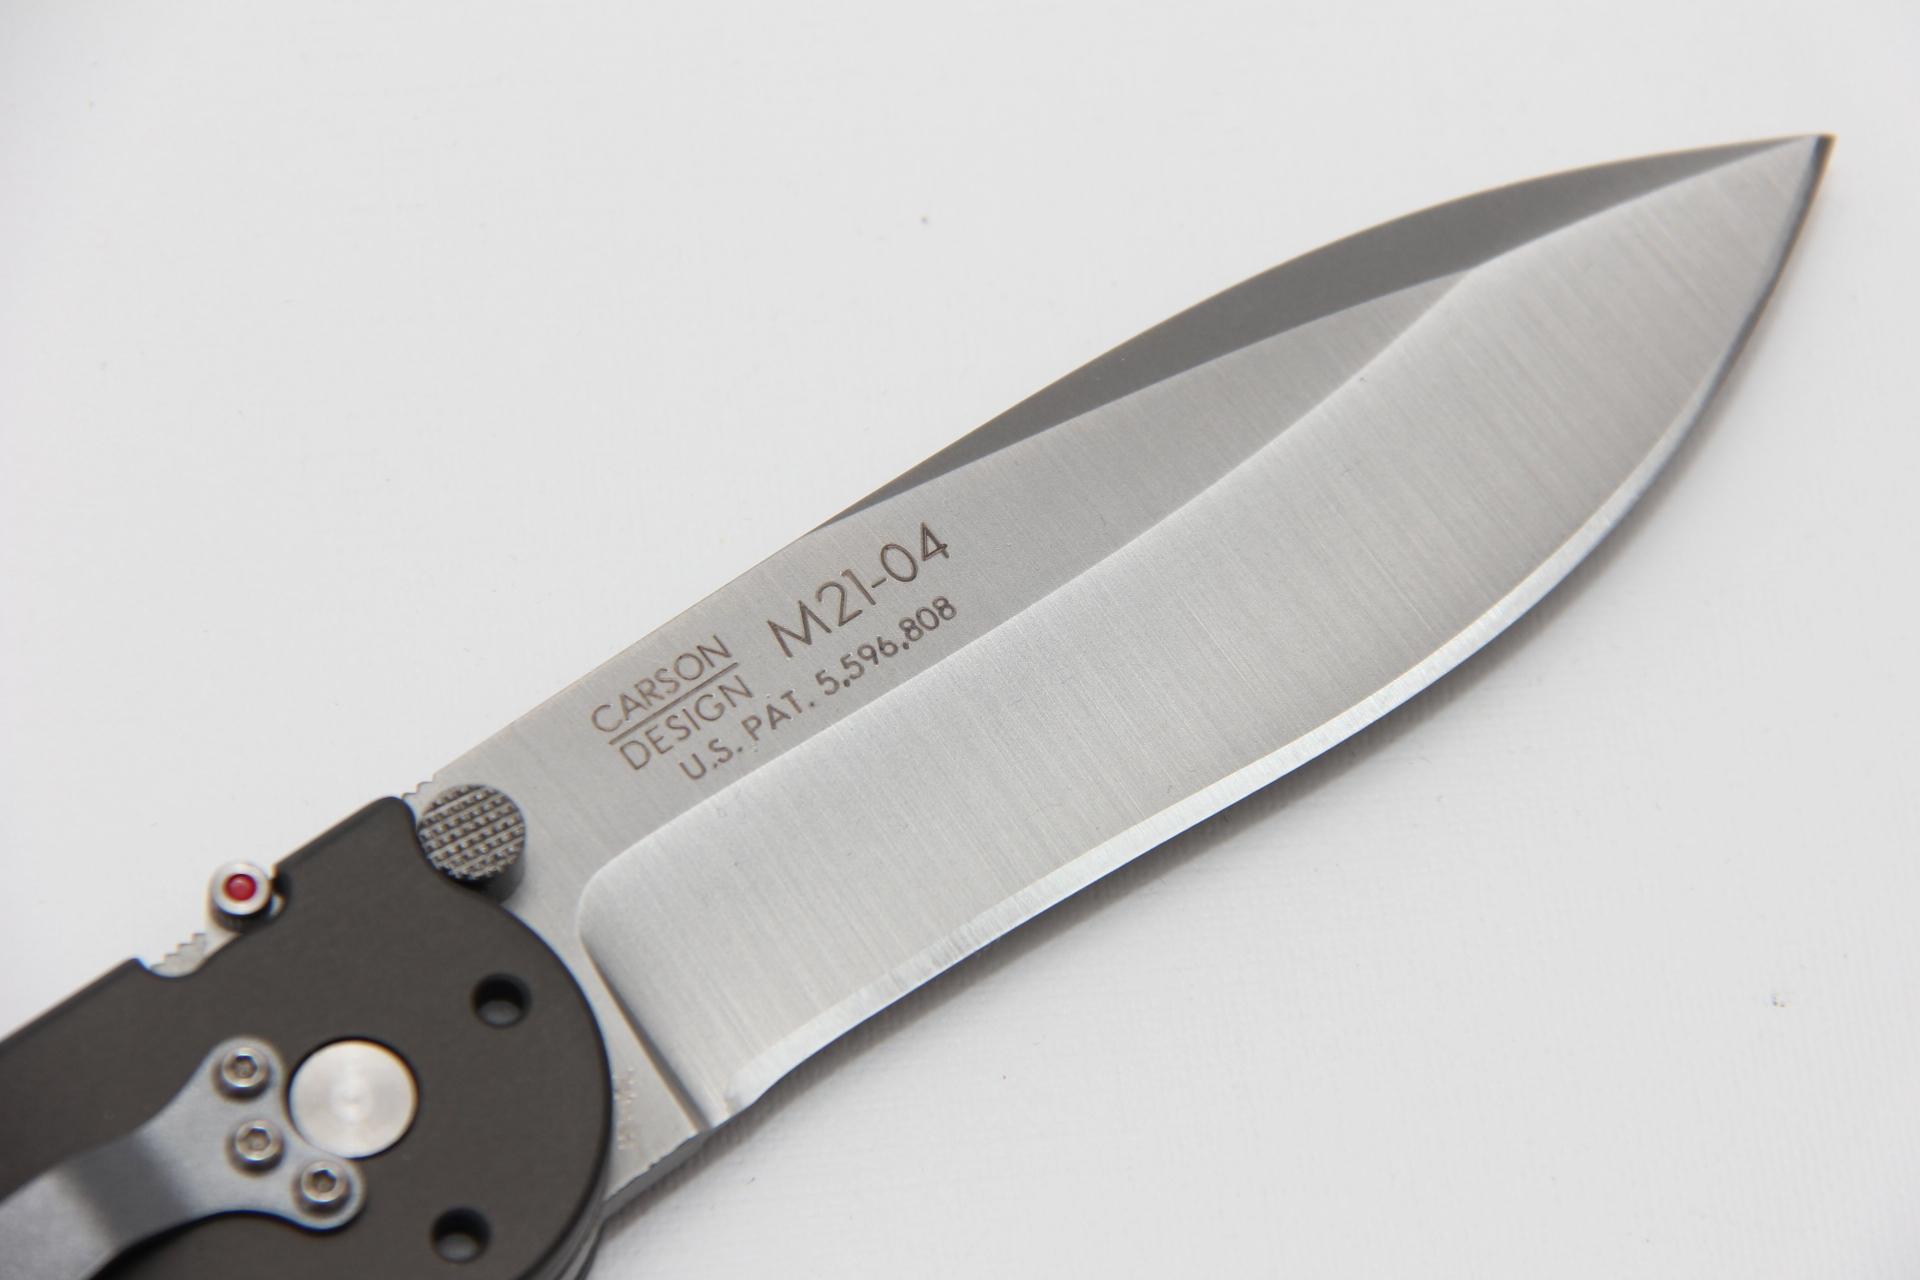 Нож CRKT M21-04 Carson Design - фотография